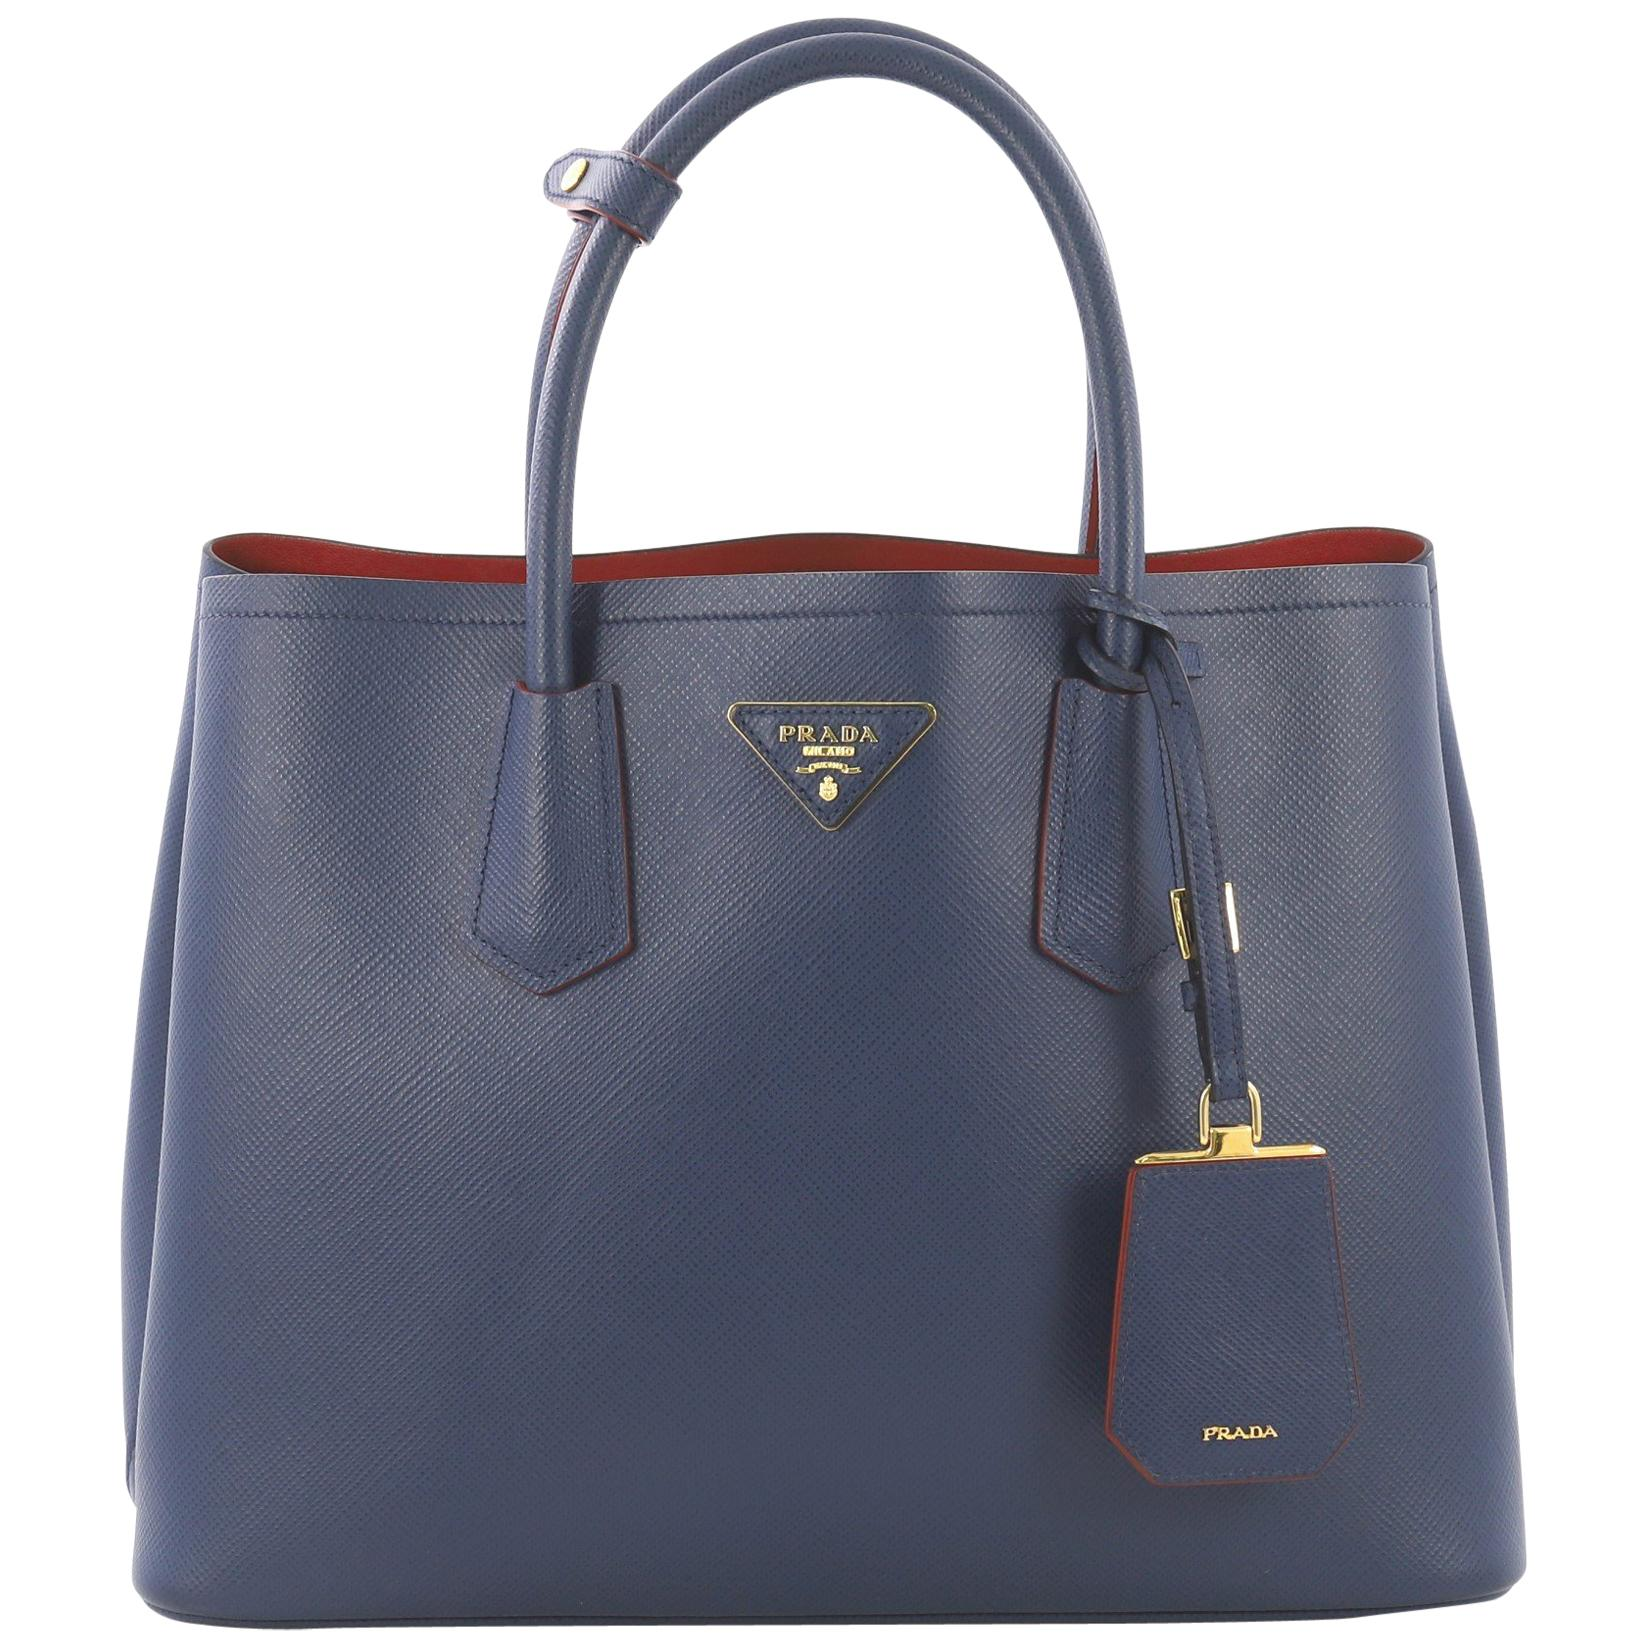 c07fbe6abdd20 Vintage Prada Handbags and Purses - 1